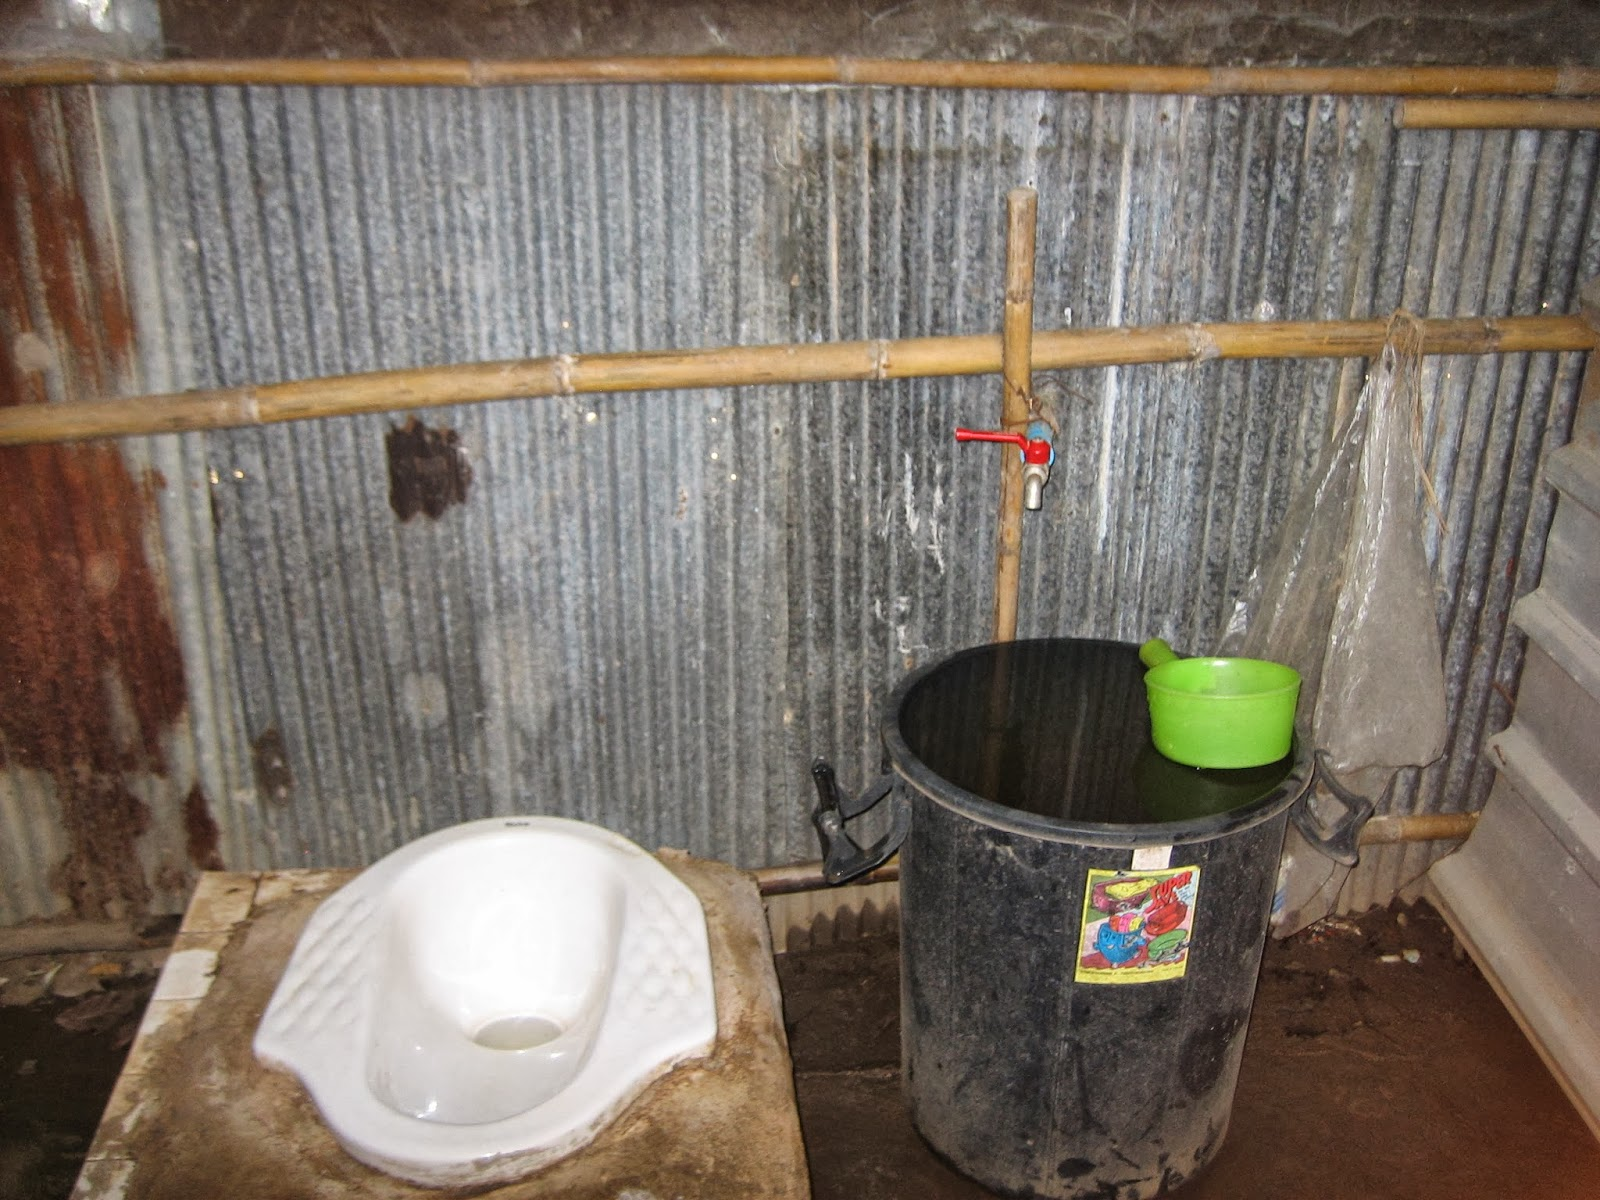 thailand-jungle-toilet